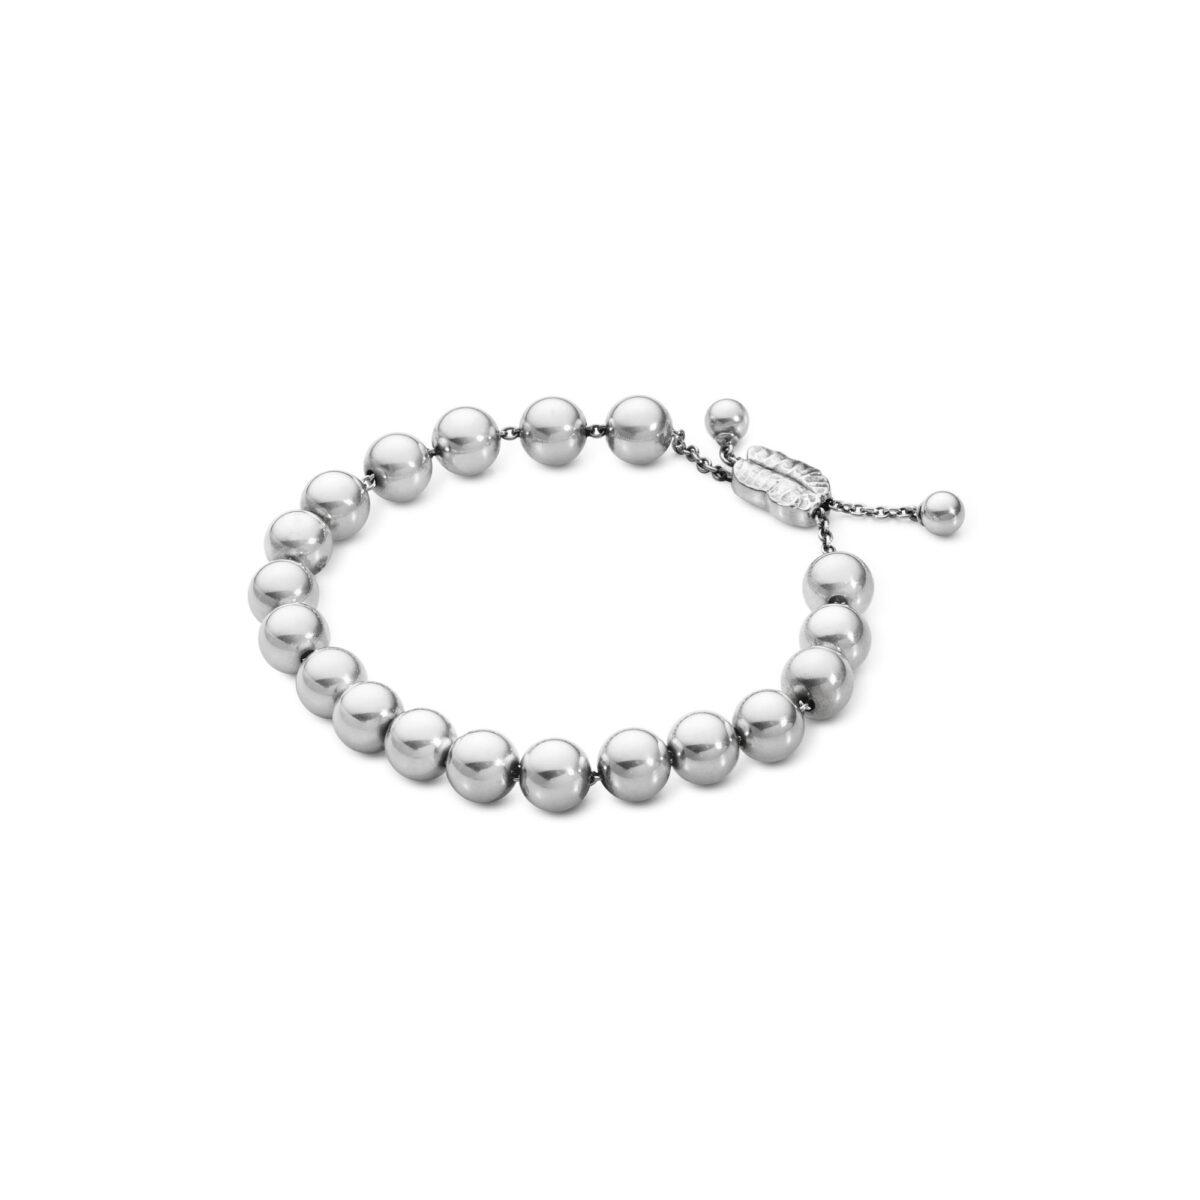 Moonlight Grapes Sterling Silver Bracelet